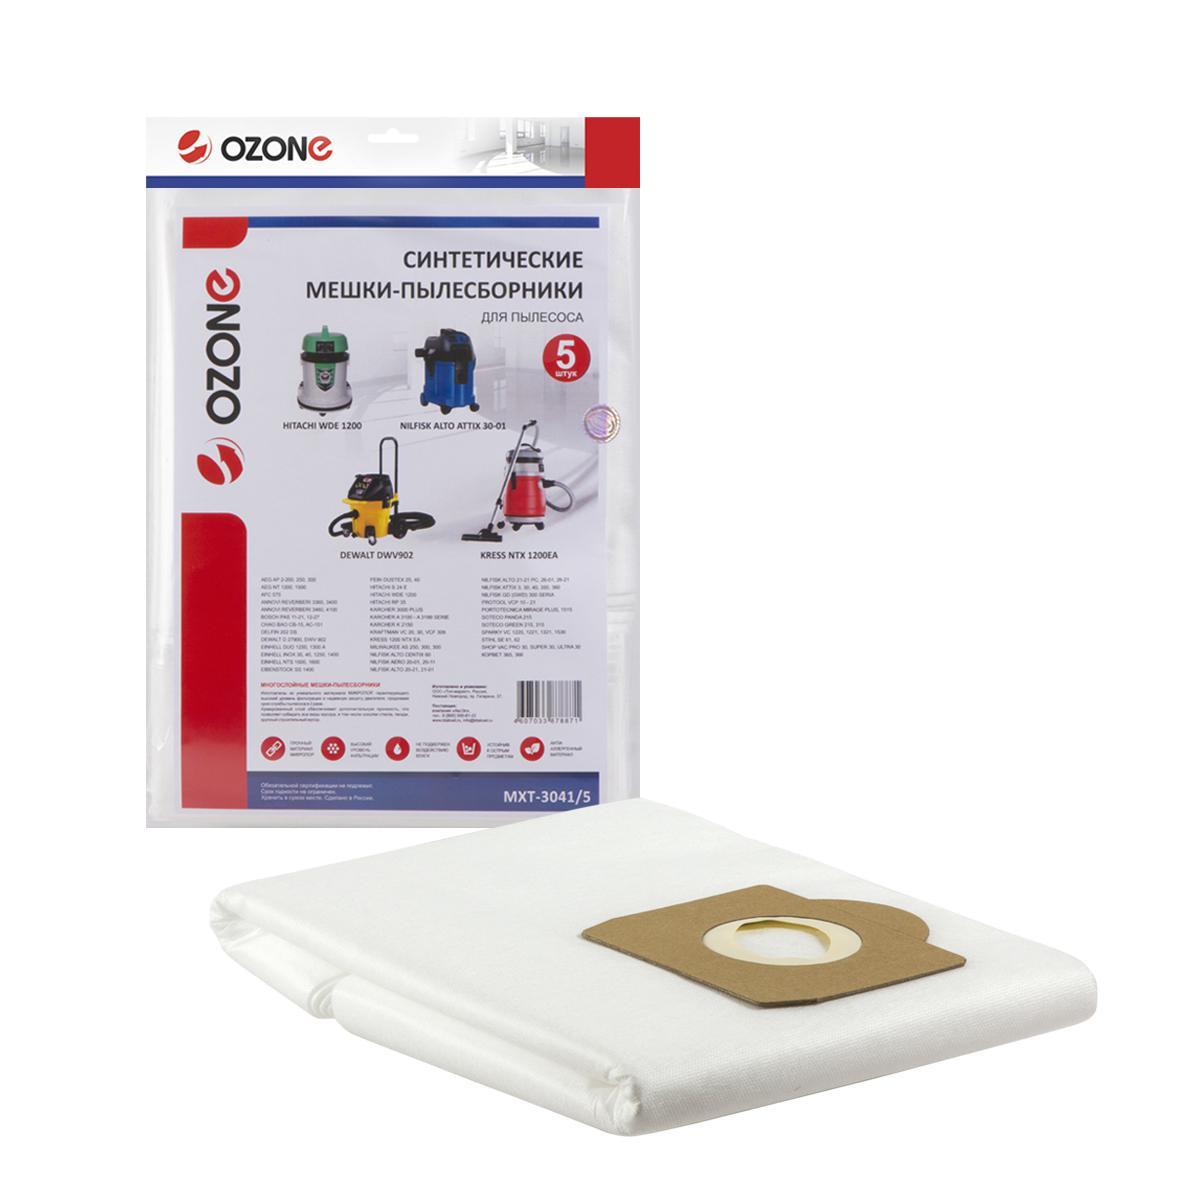 Мешок Ozone Mxt-3041/5 мешки для пылесоса аксэл mtx 3041 3